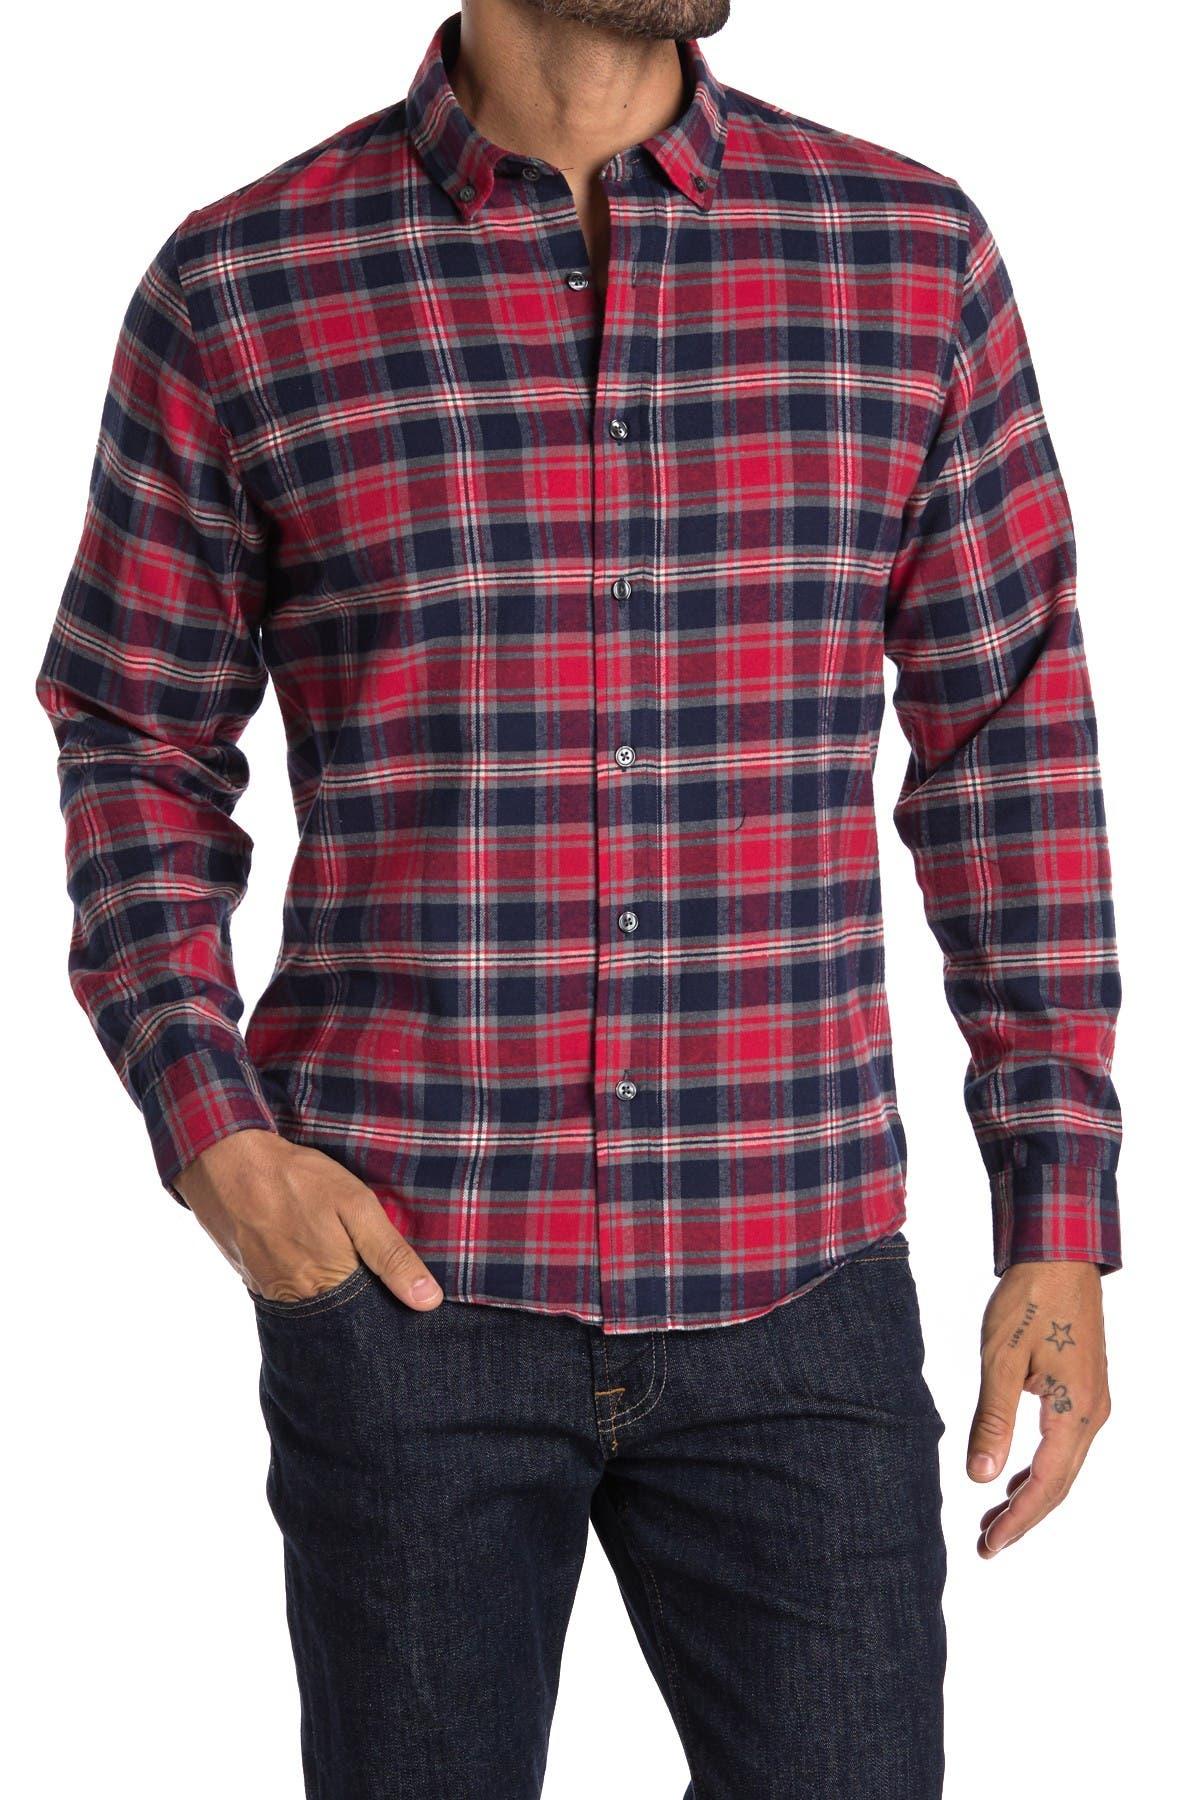 Image of Slate & Stone Woven Plaid Shirt